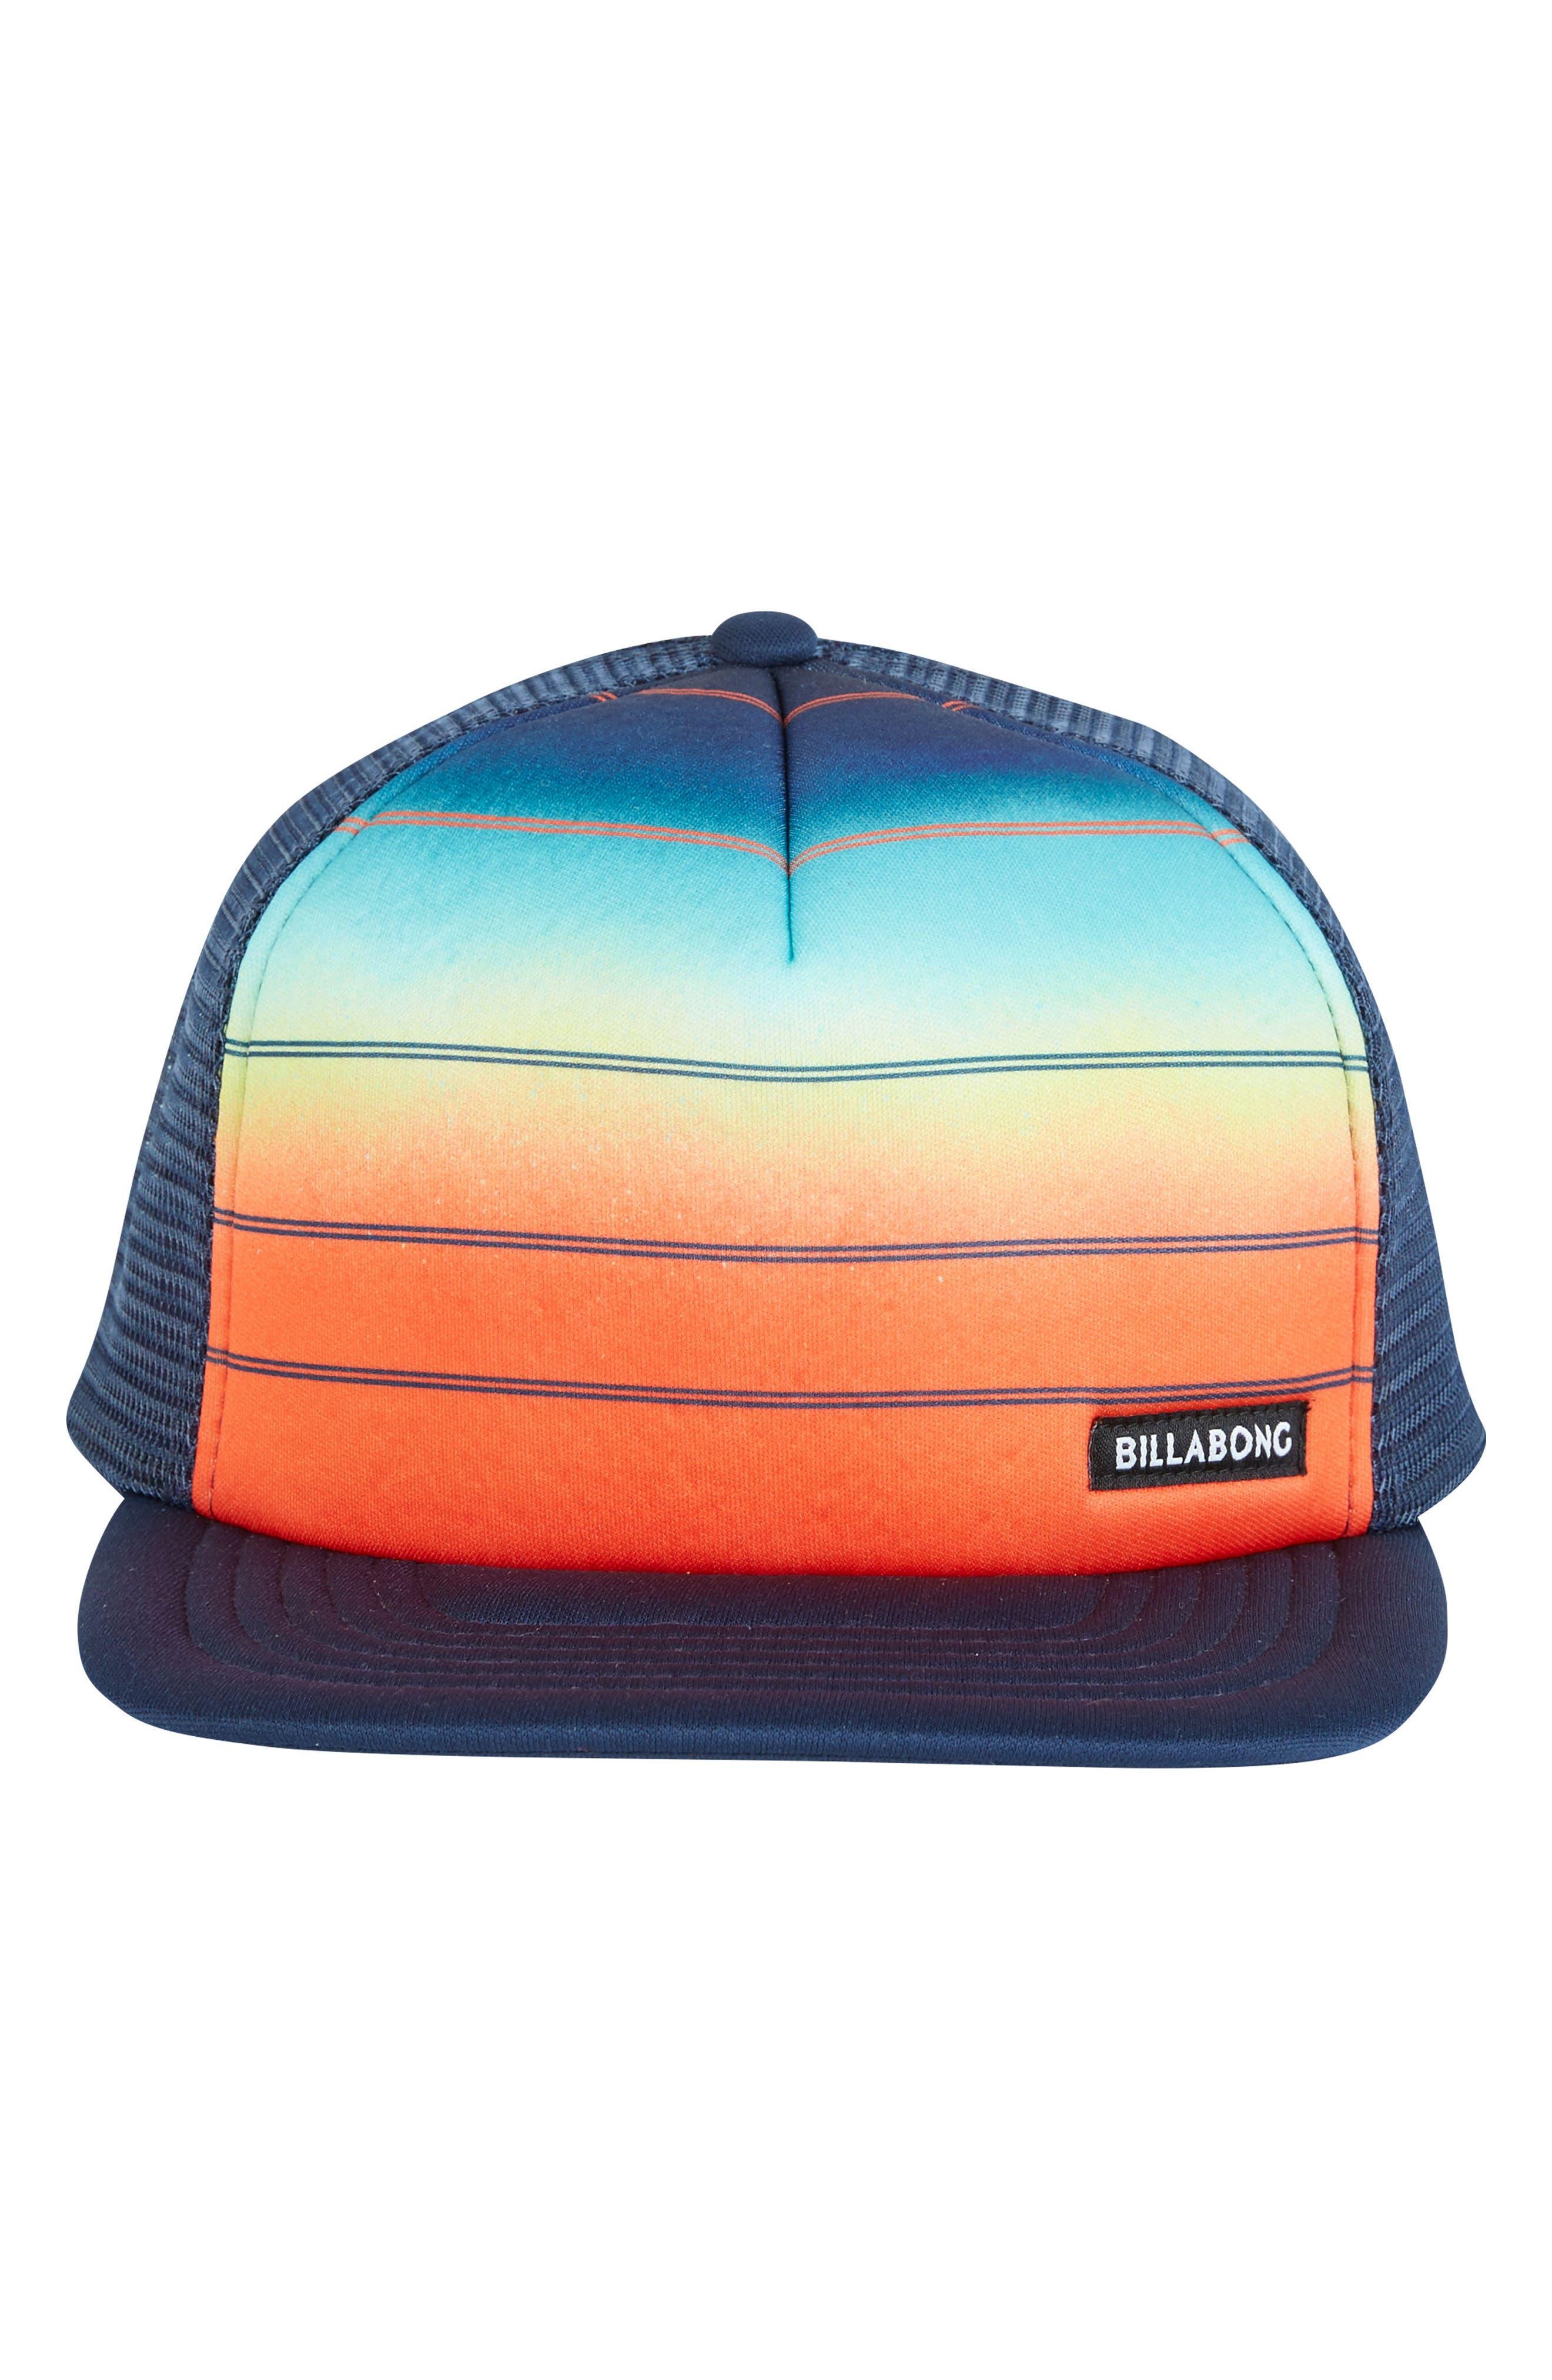 73 Snapback Trucker Hat,                             Alternate thumbnail 3, color,                             Orange